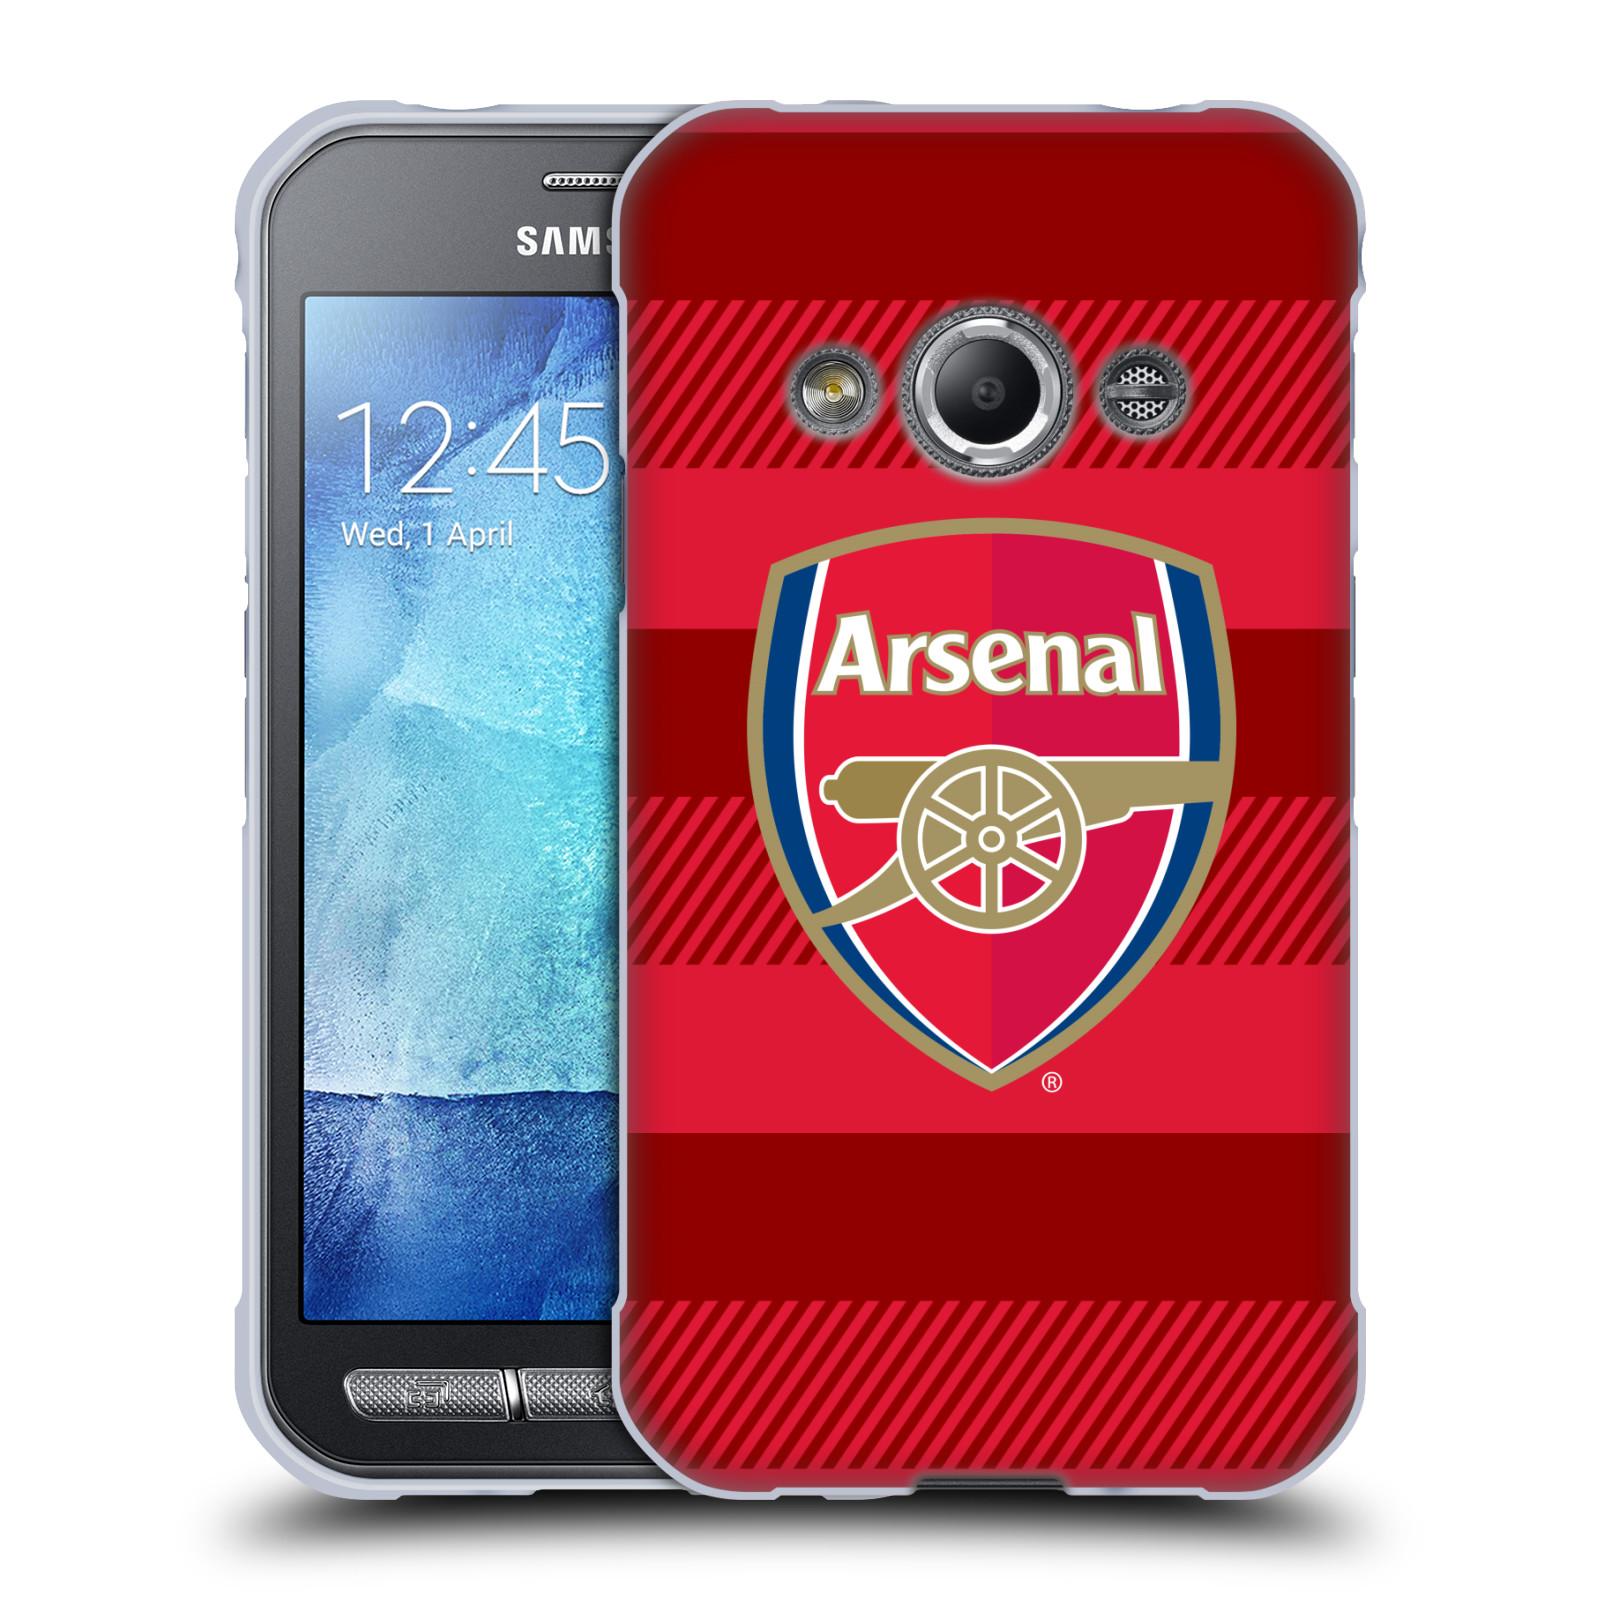 Silikonové pouzdro na mobil Samsung Galaxy Xcover 3 - Head Case - Arsenal FC - Logo s pruhy